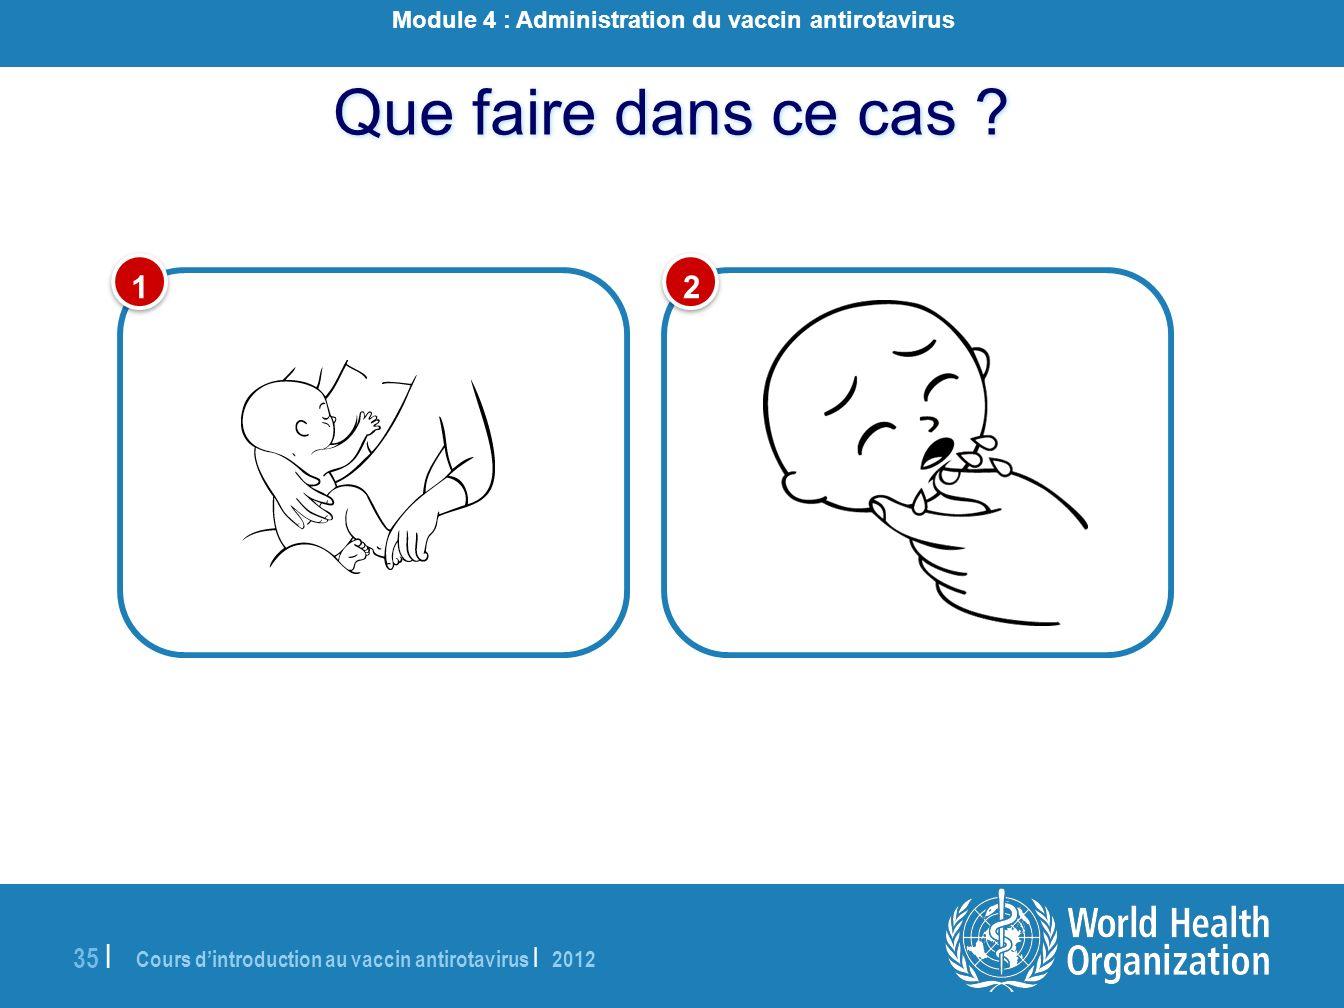 Cours dintroduction au vaccin antirotavirus | 2012 35 | Que faire dans ce cas ? 1 1 2 2 Module 4 : Administration du vaccin antirotavirus